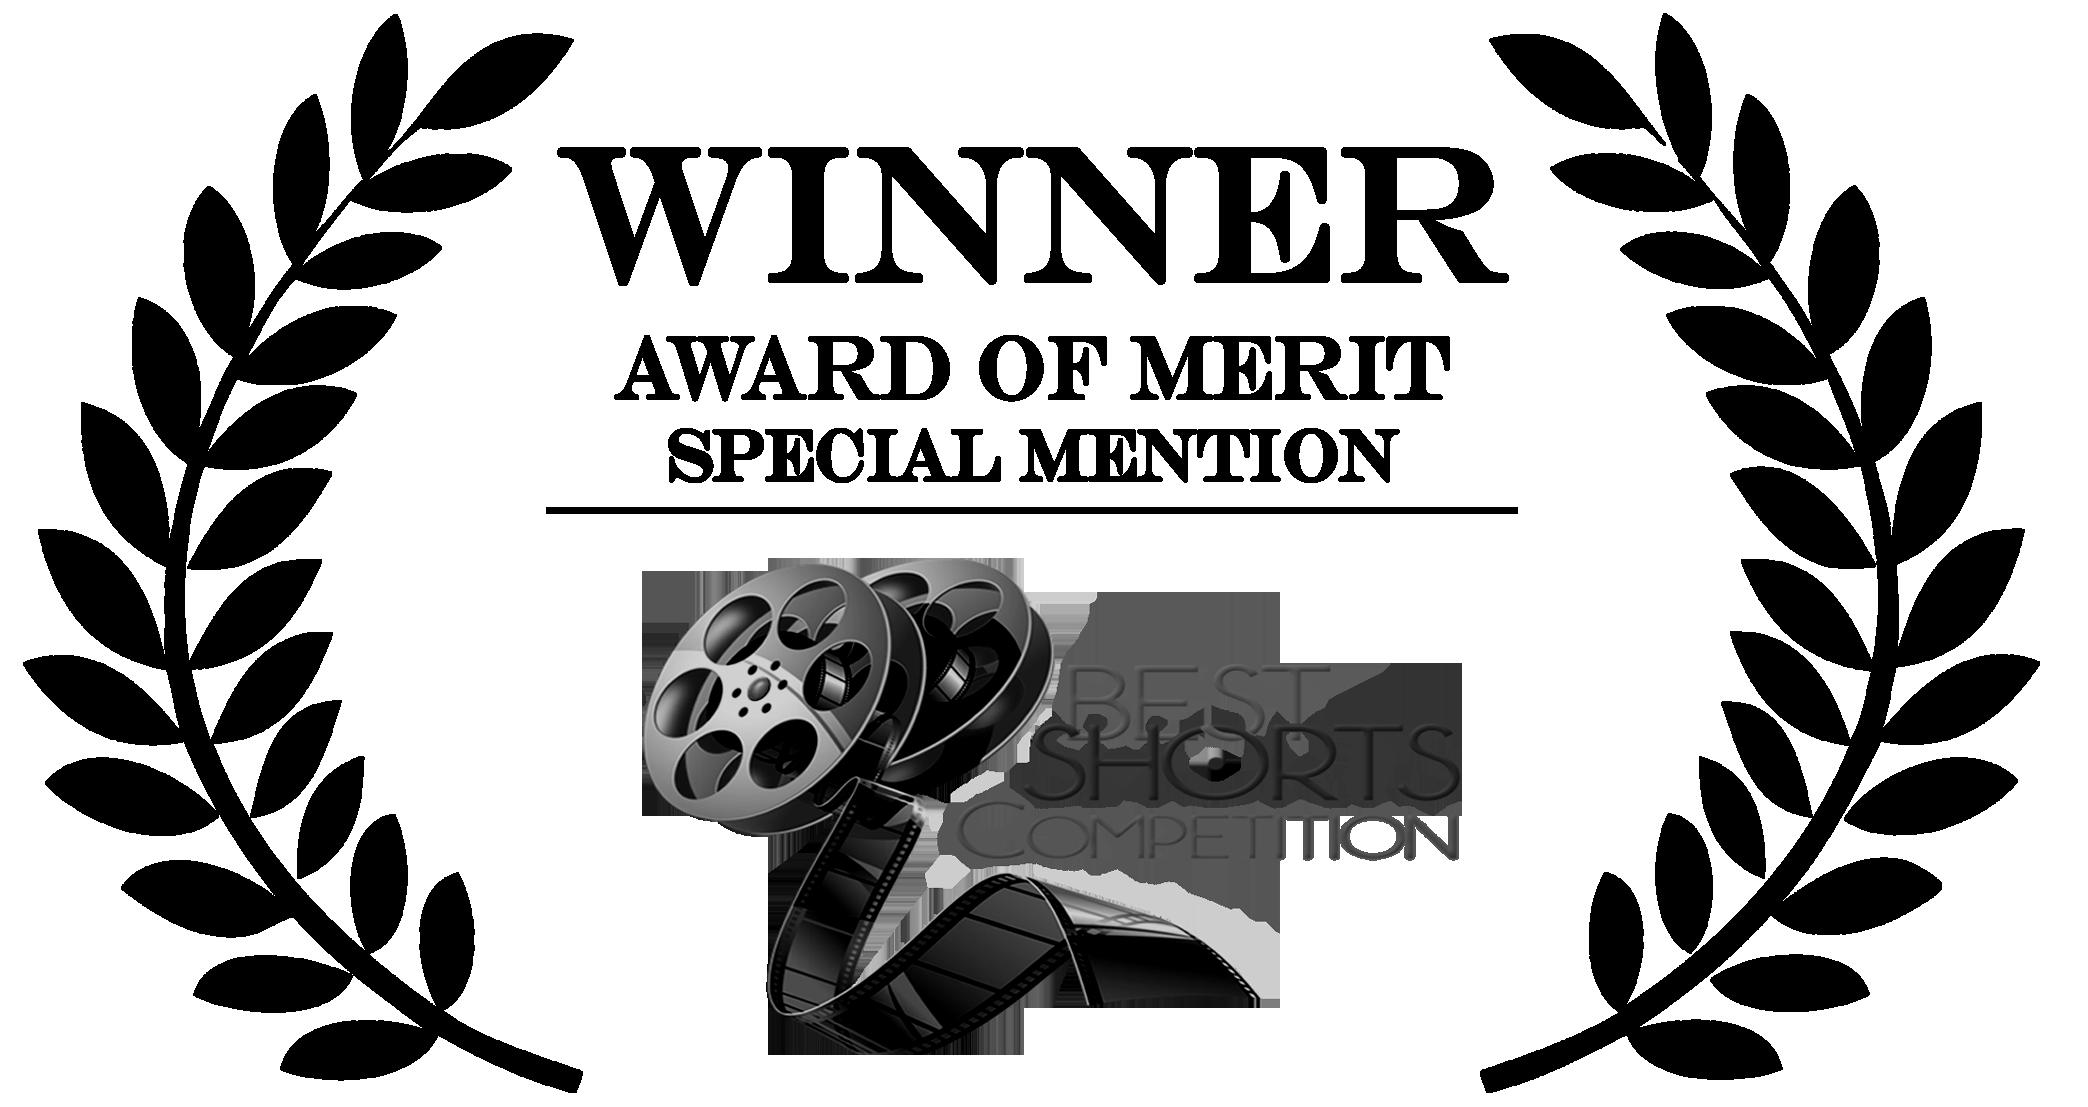 BEST-SHORTS-Merit-SM-logo-black.png